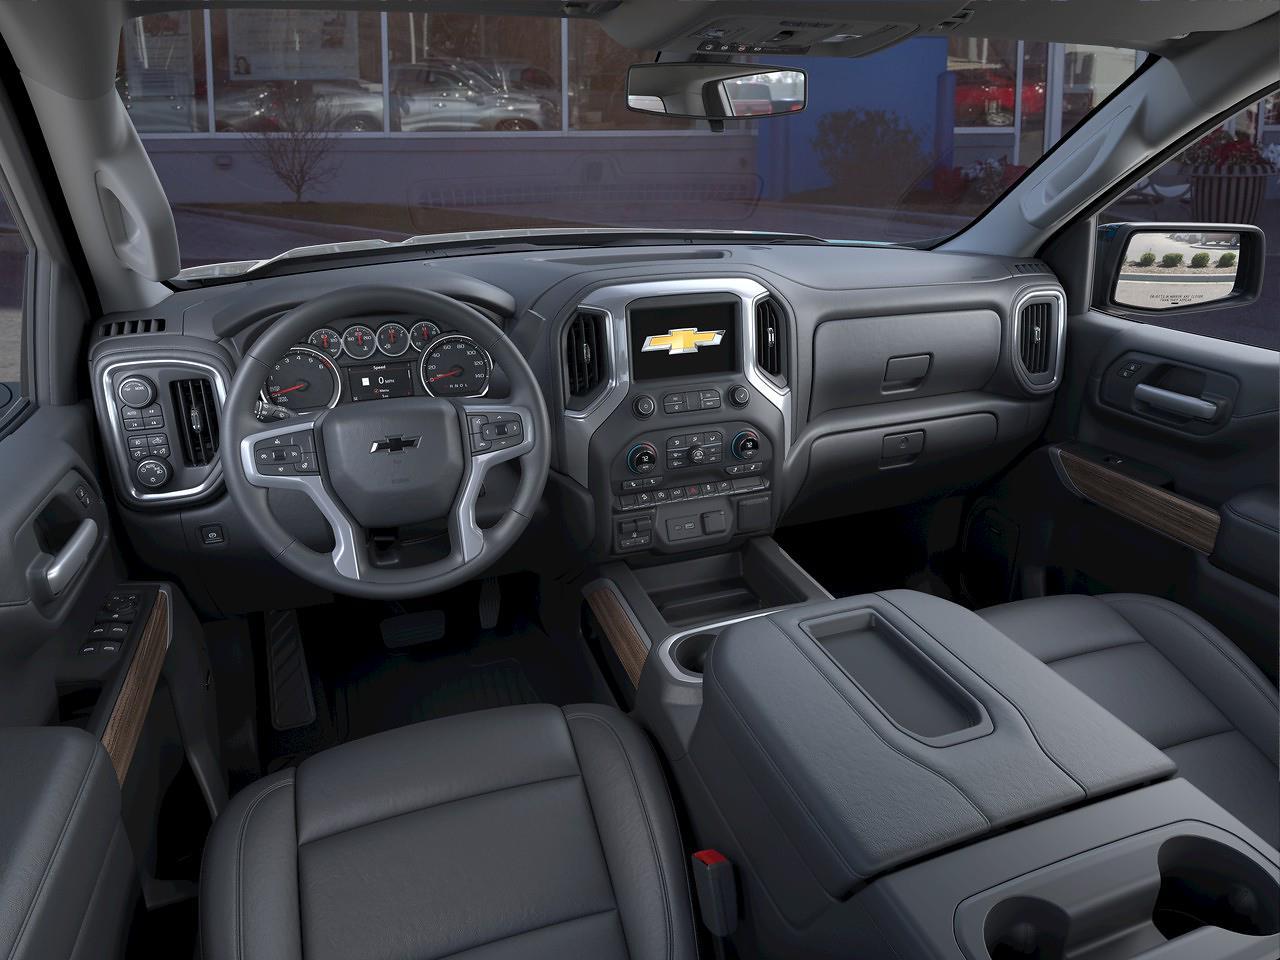 2021 Chevrolet Silverado 1500 Crew Cab 4x4, Pickup #CK1533 - photo 12